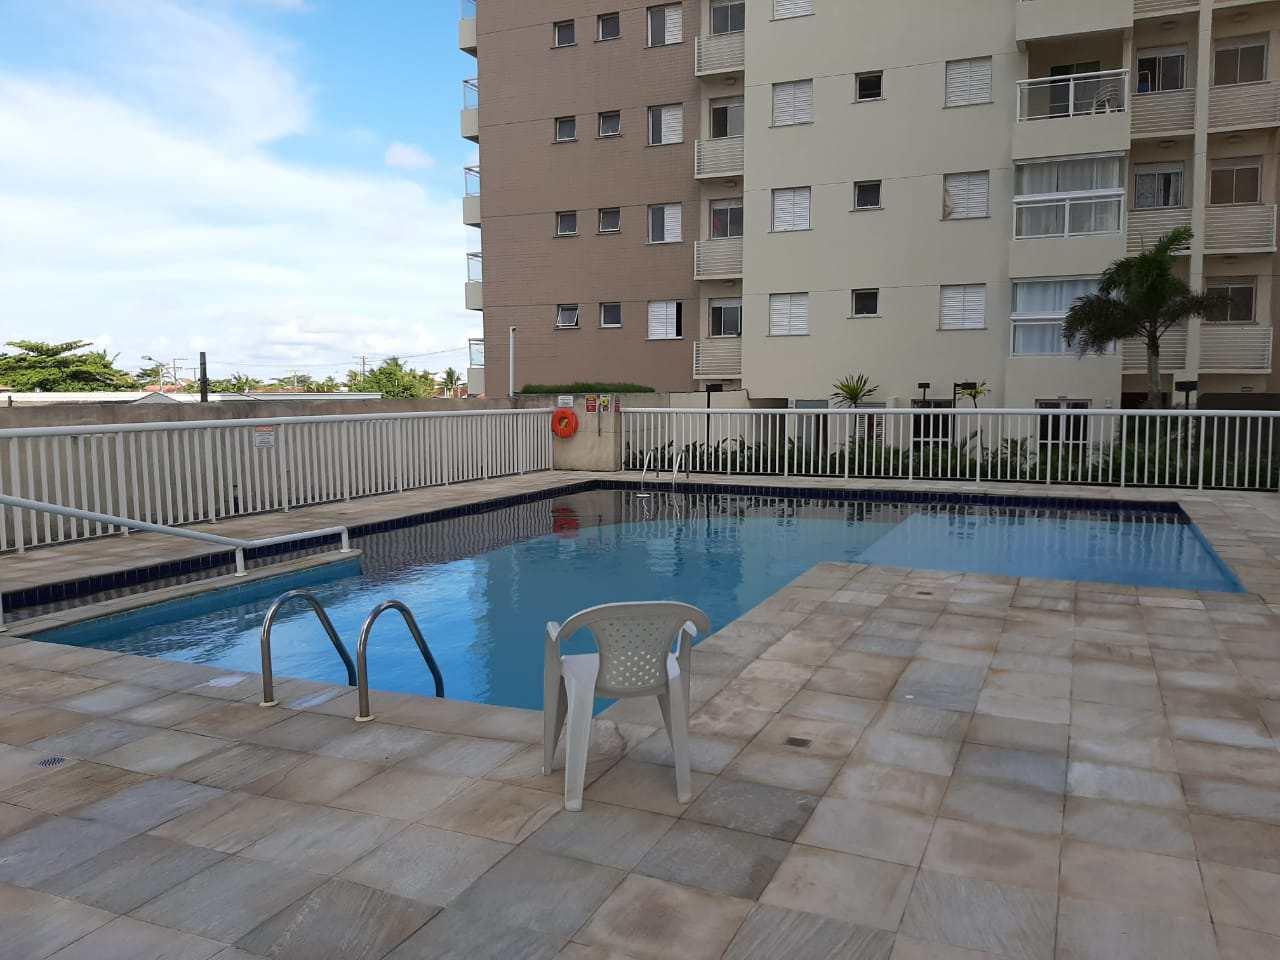 Apartamento com 2 dorms, Jardim Ibera, Itanhaém - R$ 250 mil, Cod: 92